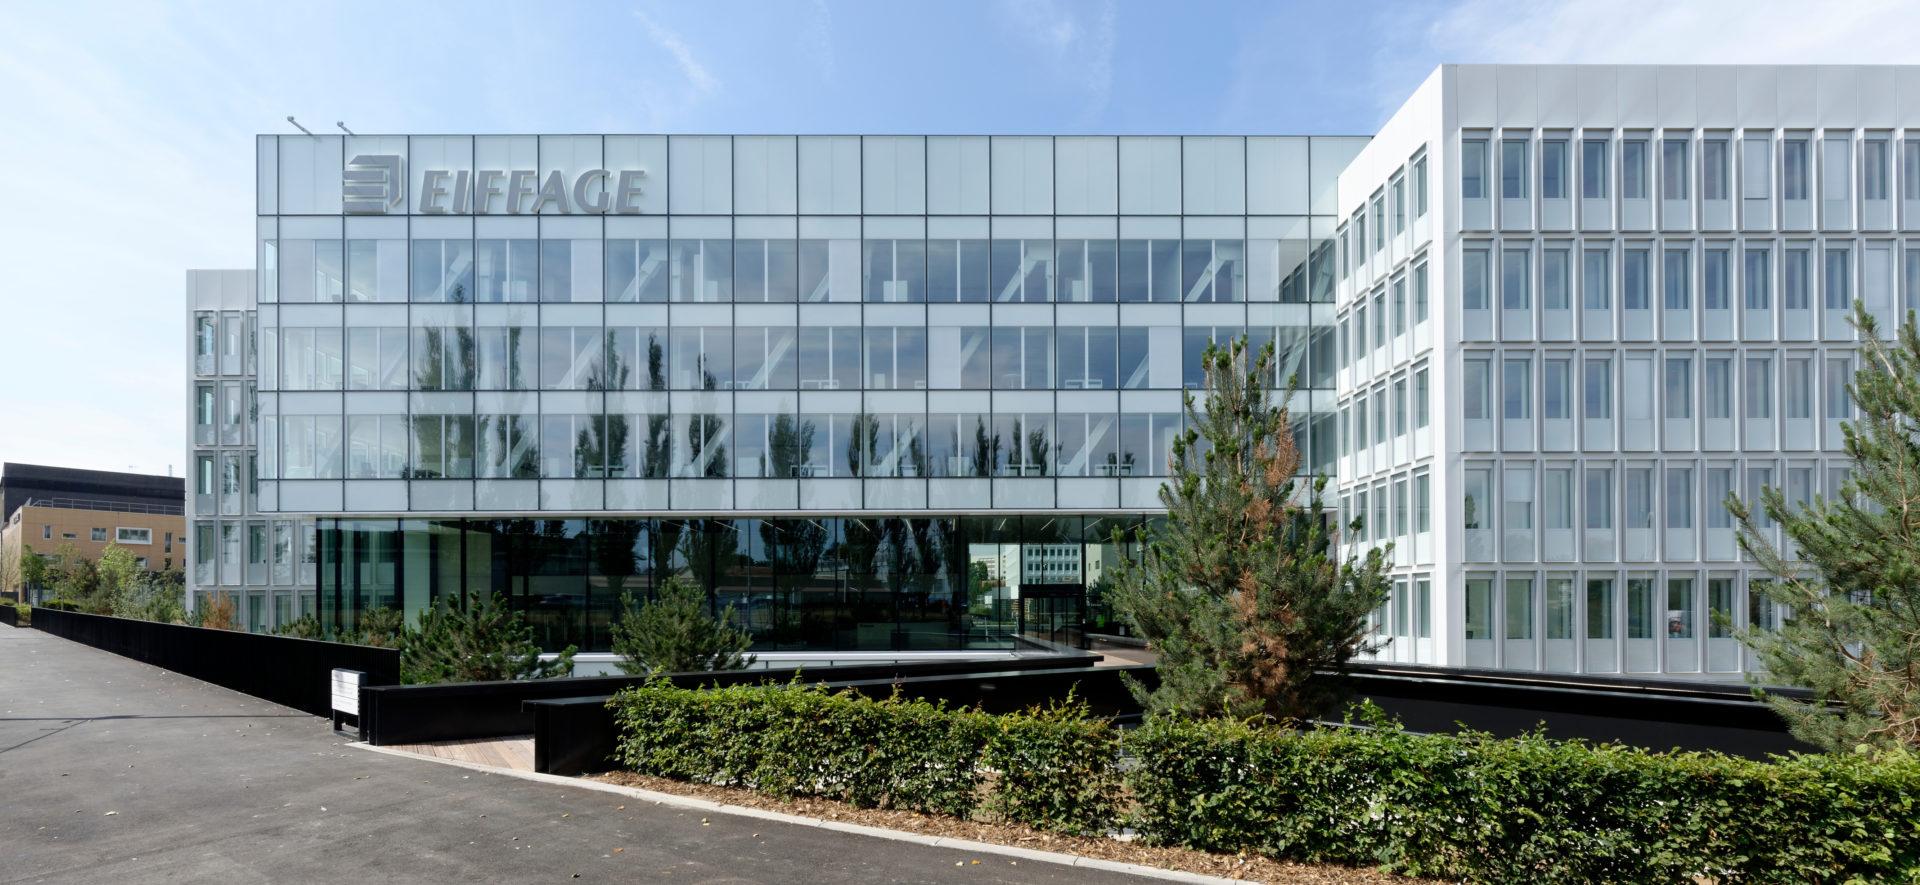 CampusEiffage-Gabarit-unic-web-projets-2560x1180px